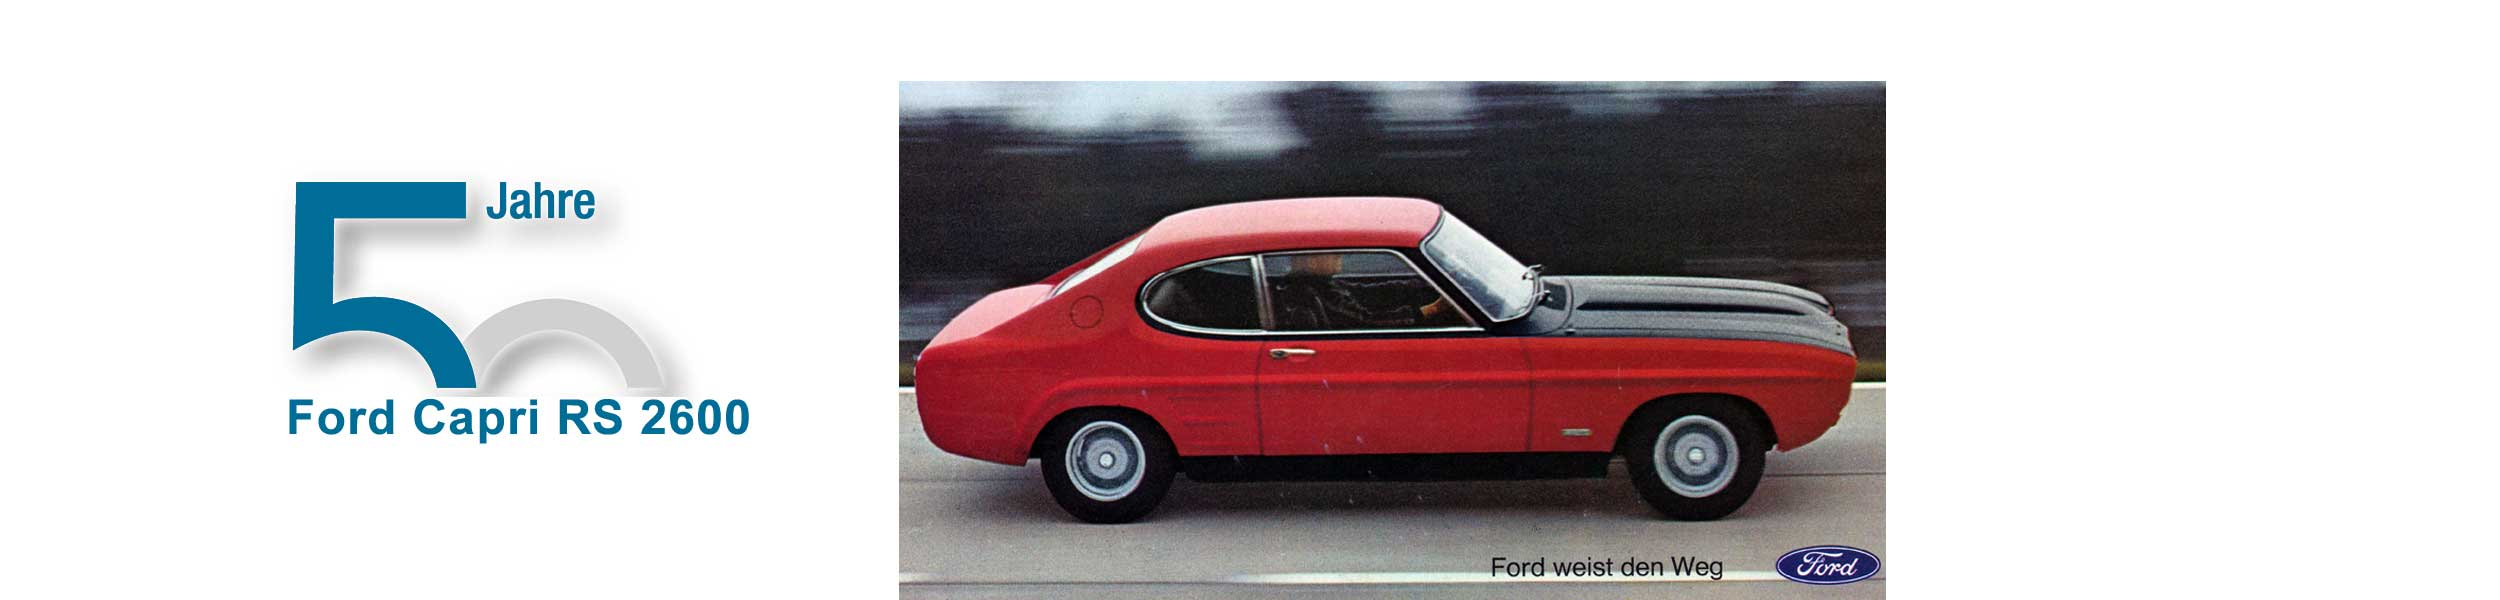 50 Jahre Ford Capri RS 2600